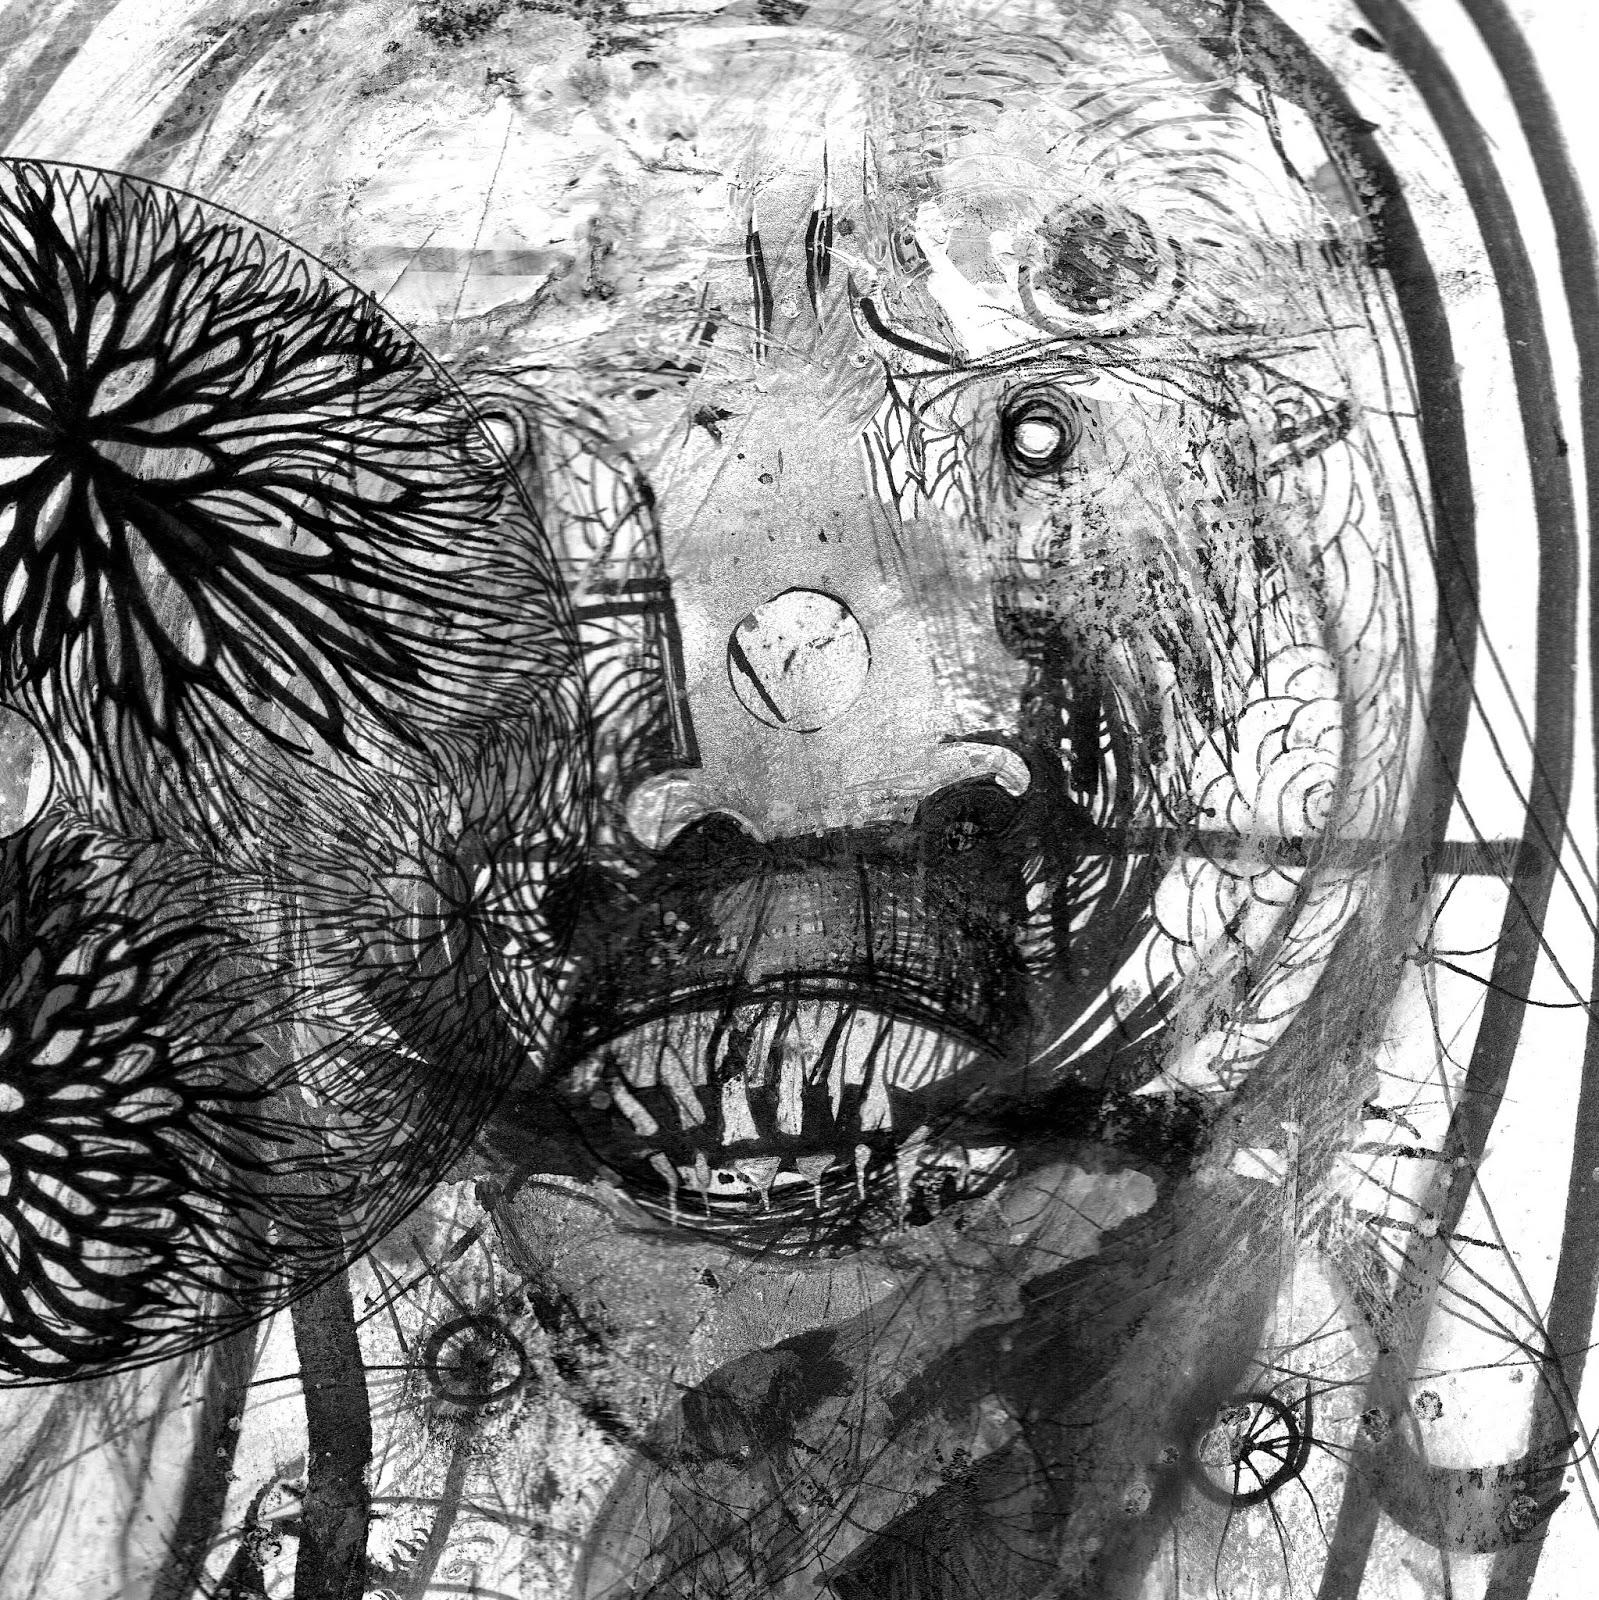 Sonance - Like Ghosts